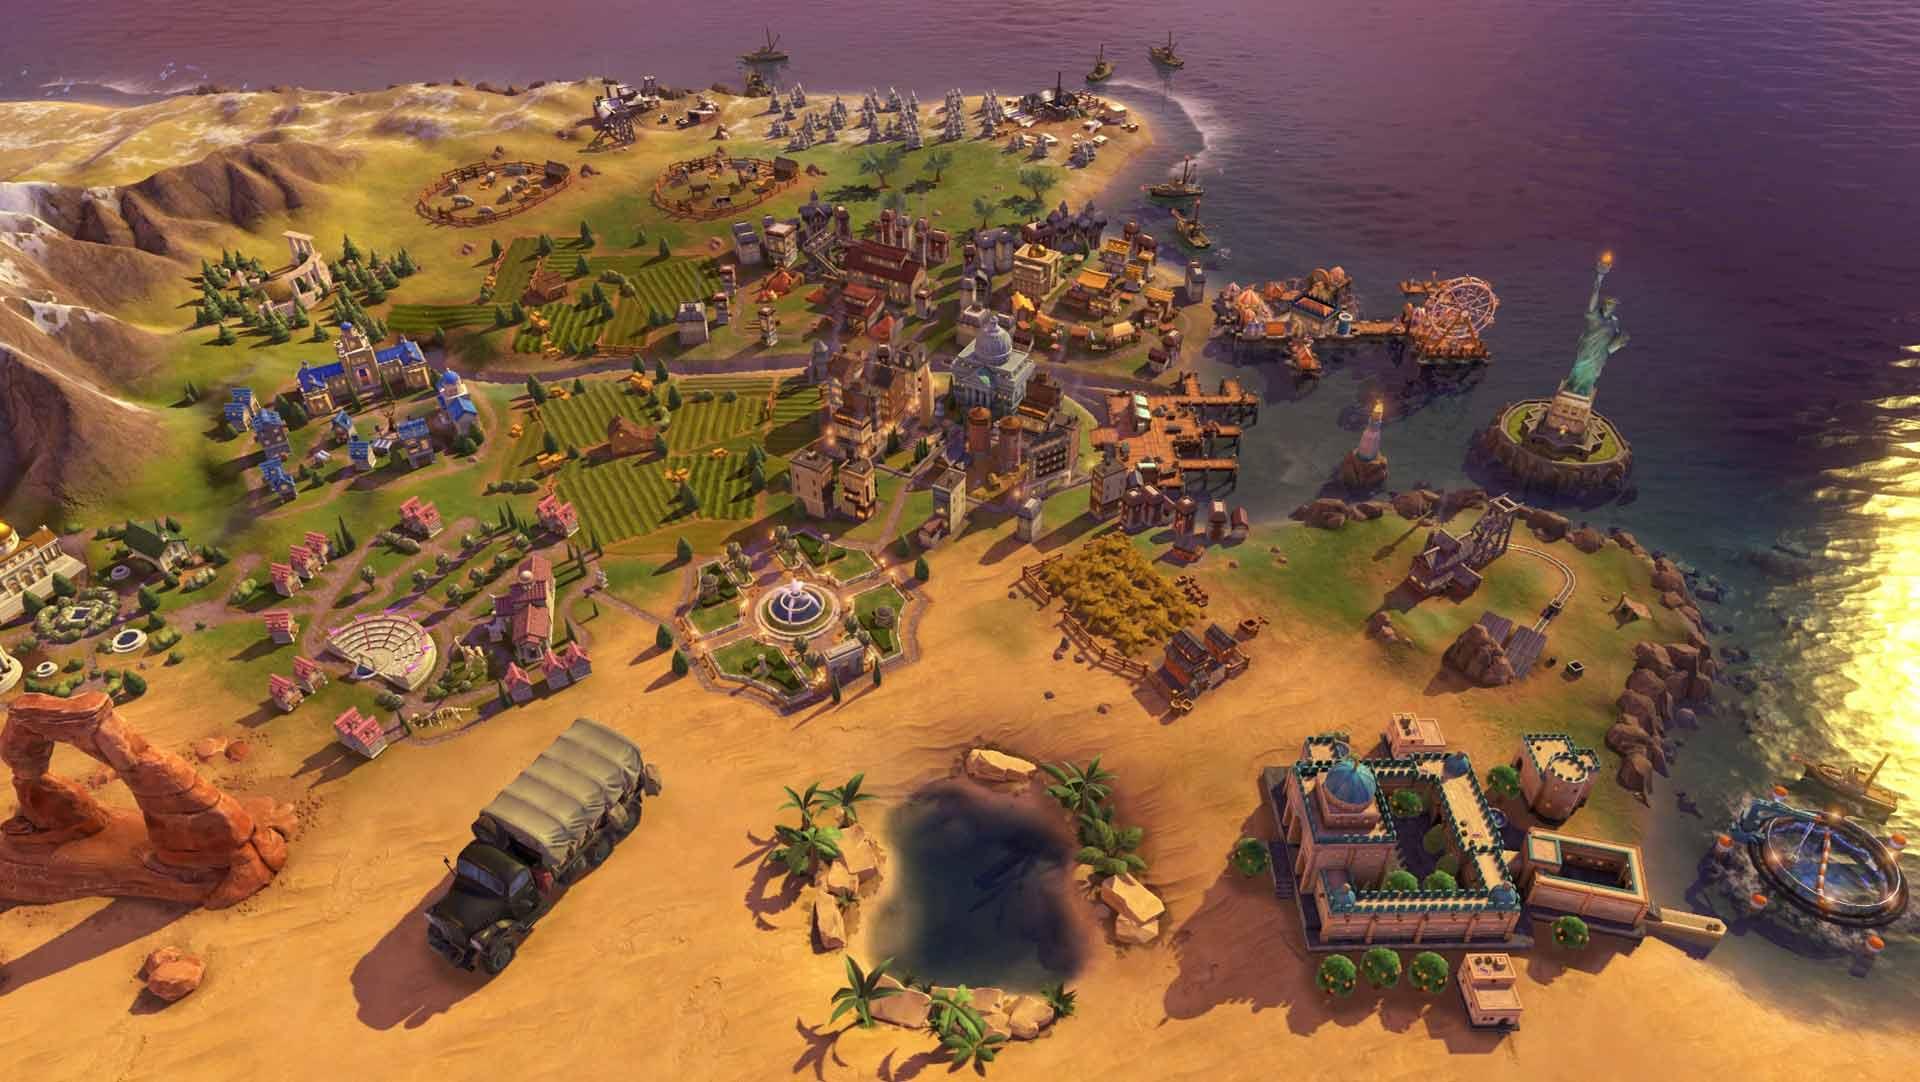 Sid Meier's Civilization VI: Gathering Storm game image